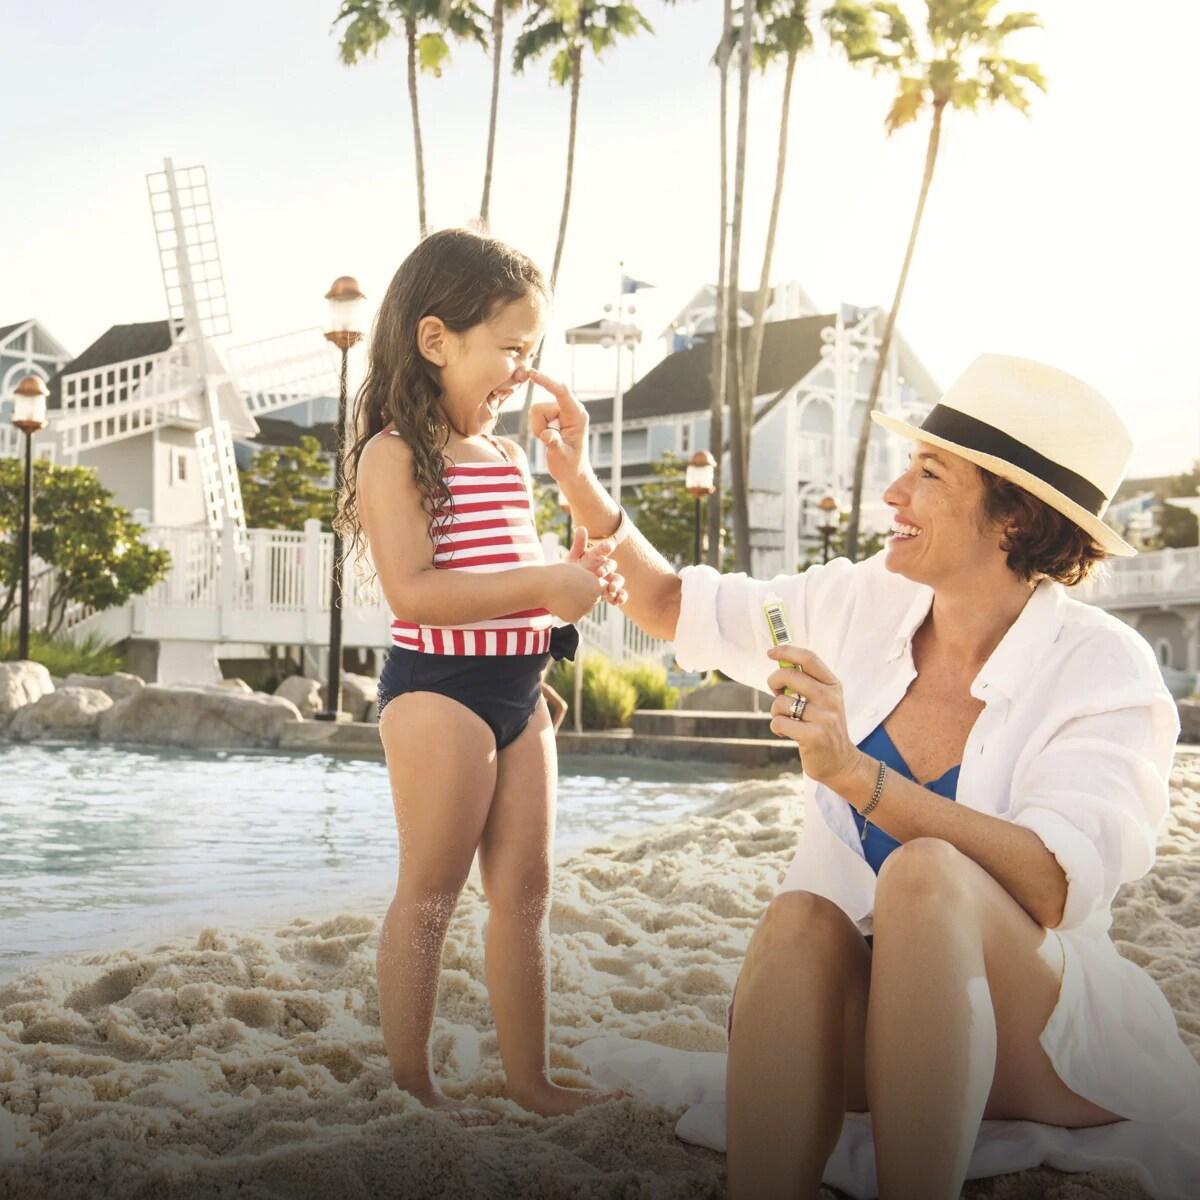 Mãe e filha a rirem-se numa praia